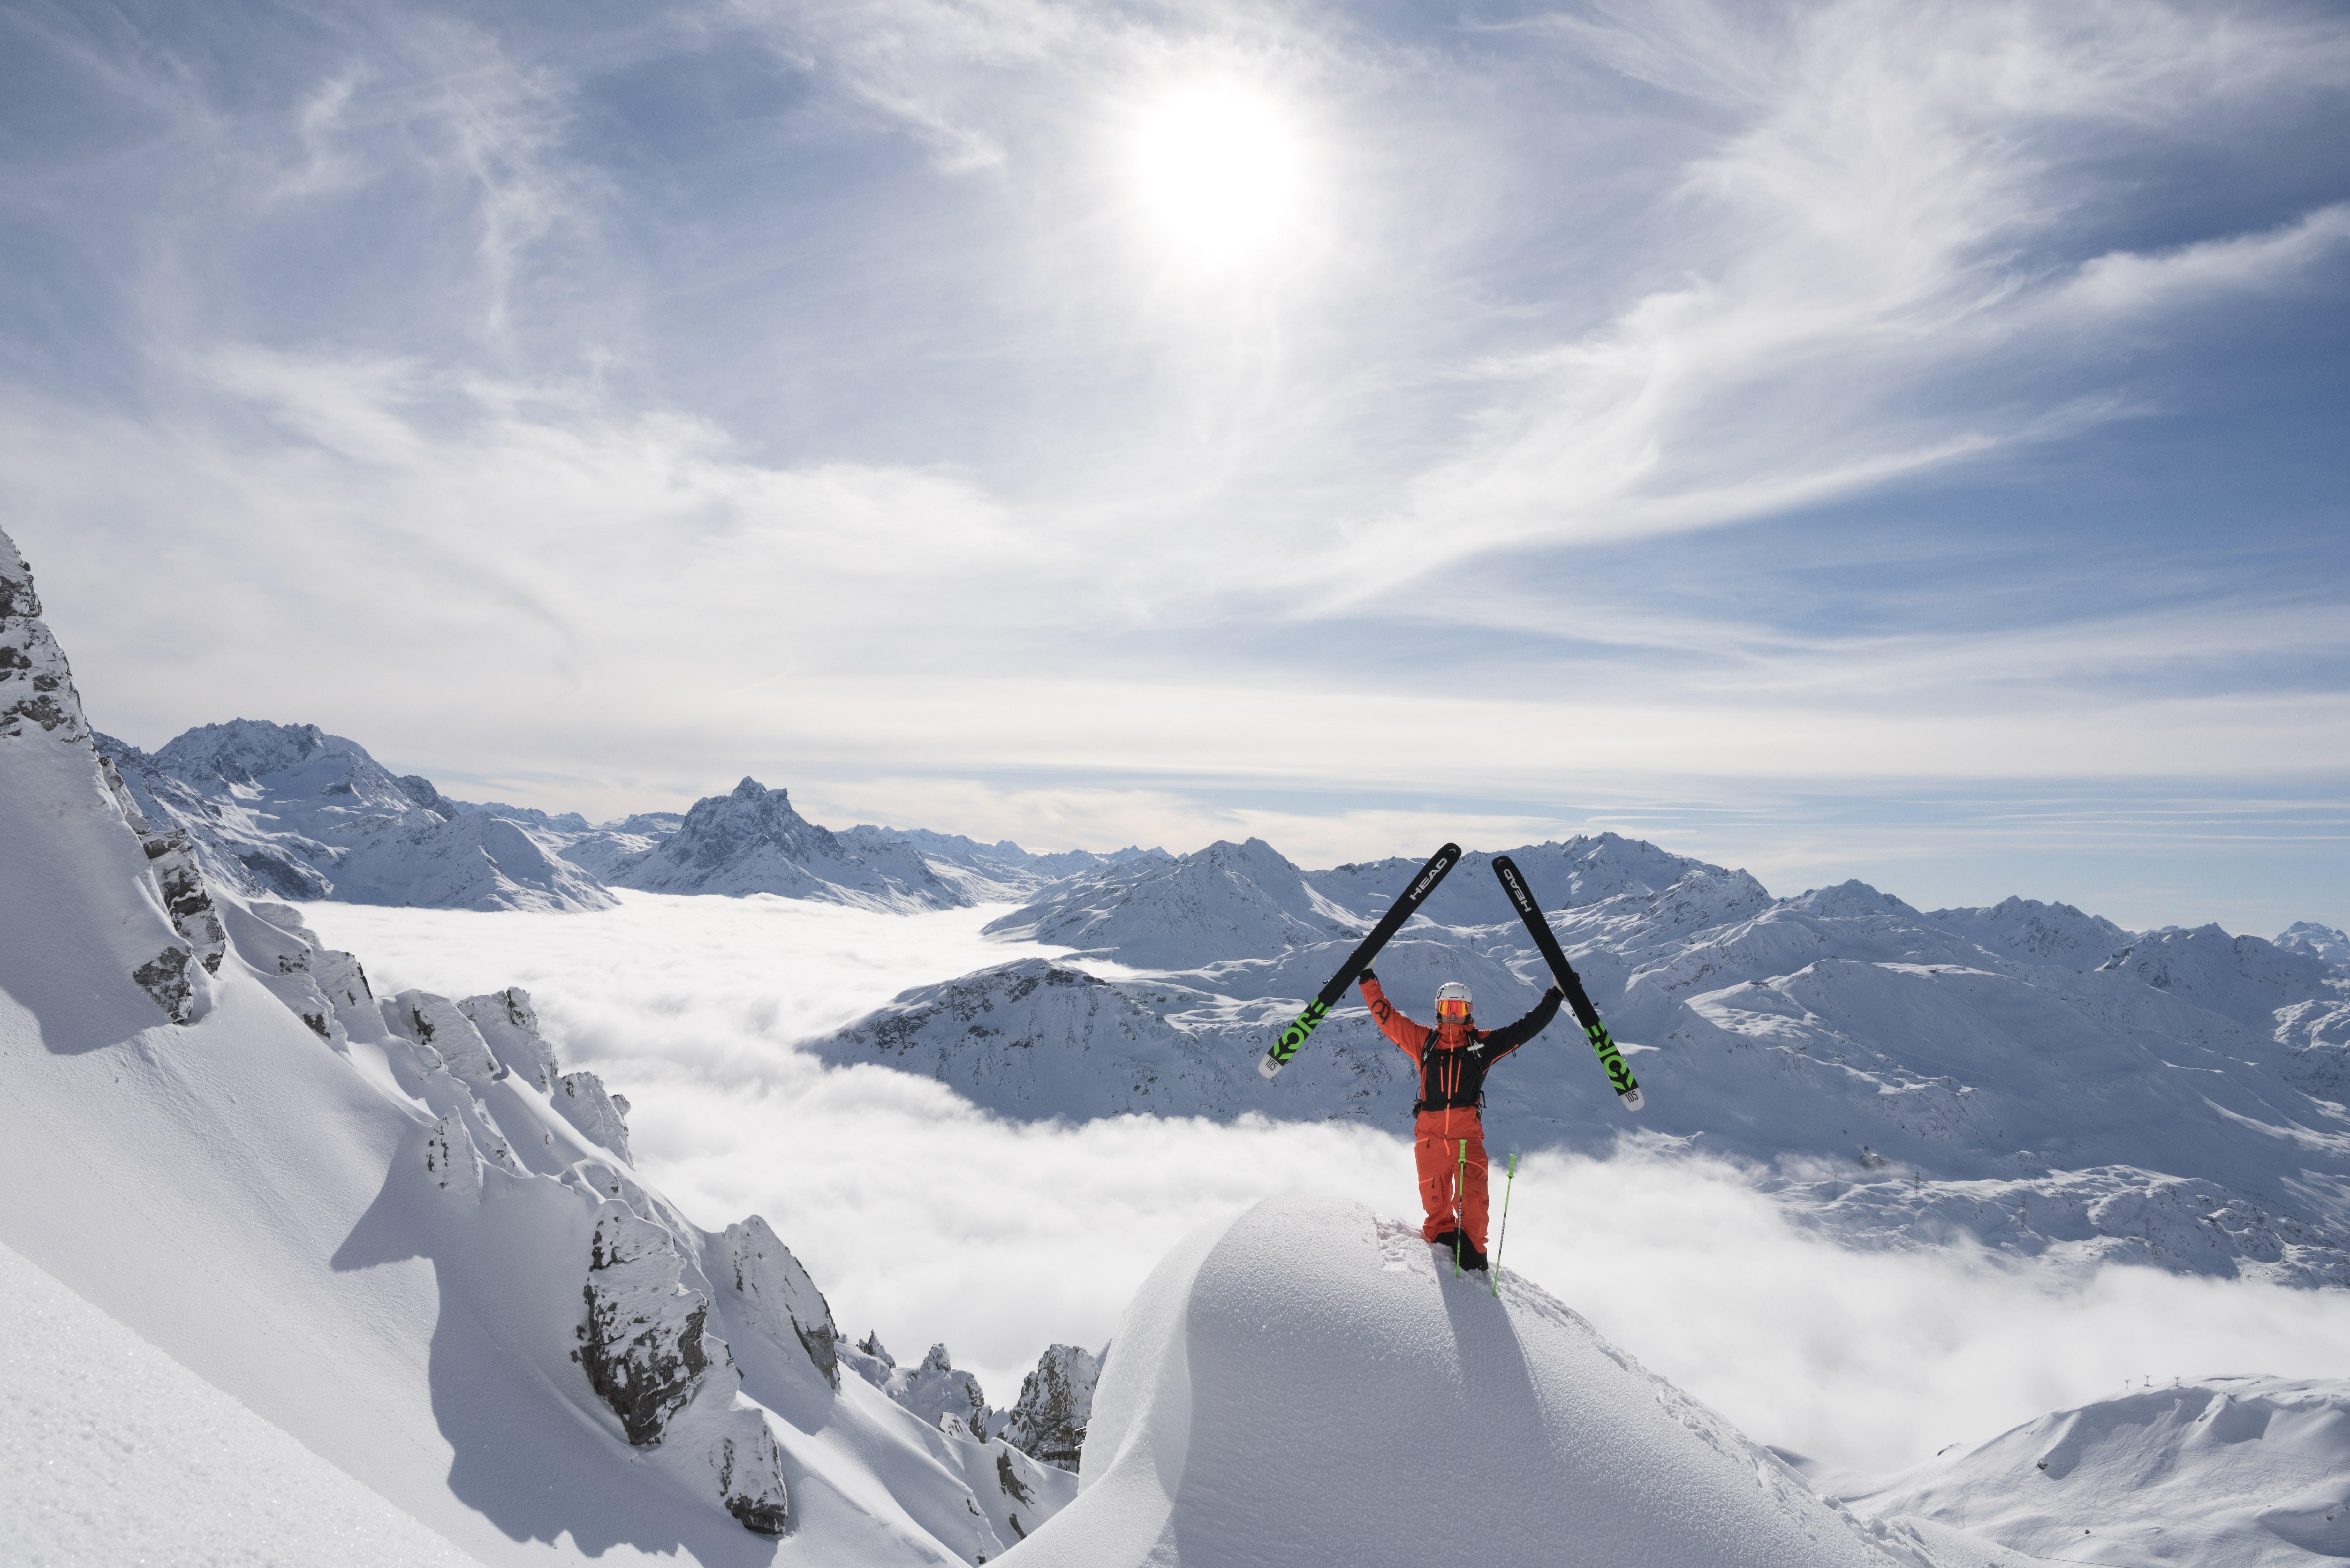 St. Anton am Arlberg is an Austrian village in the Tyrolean Alps.